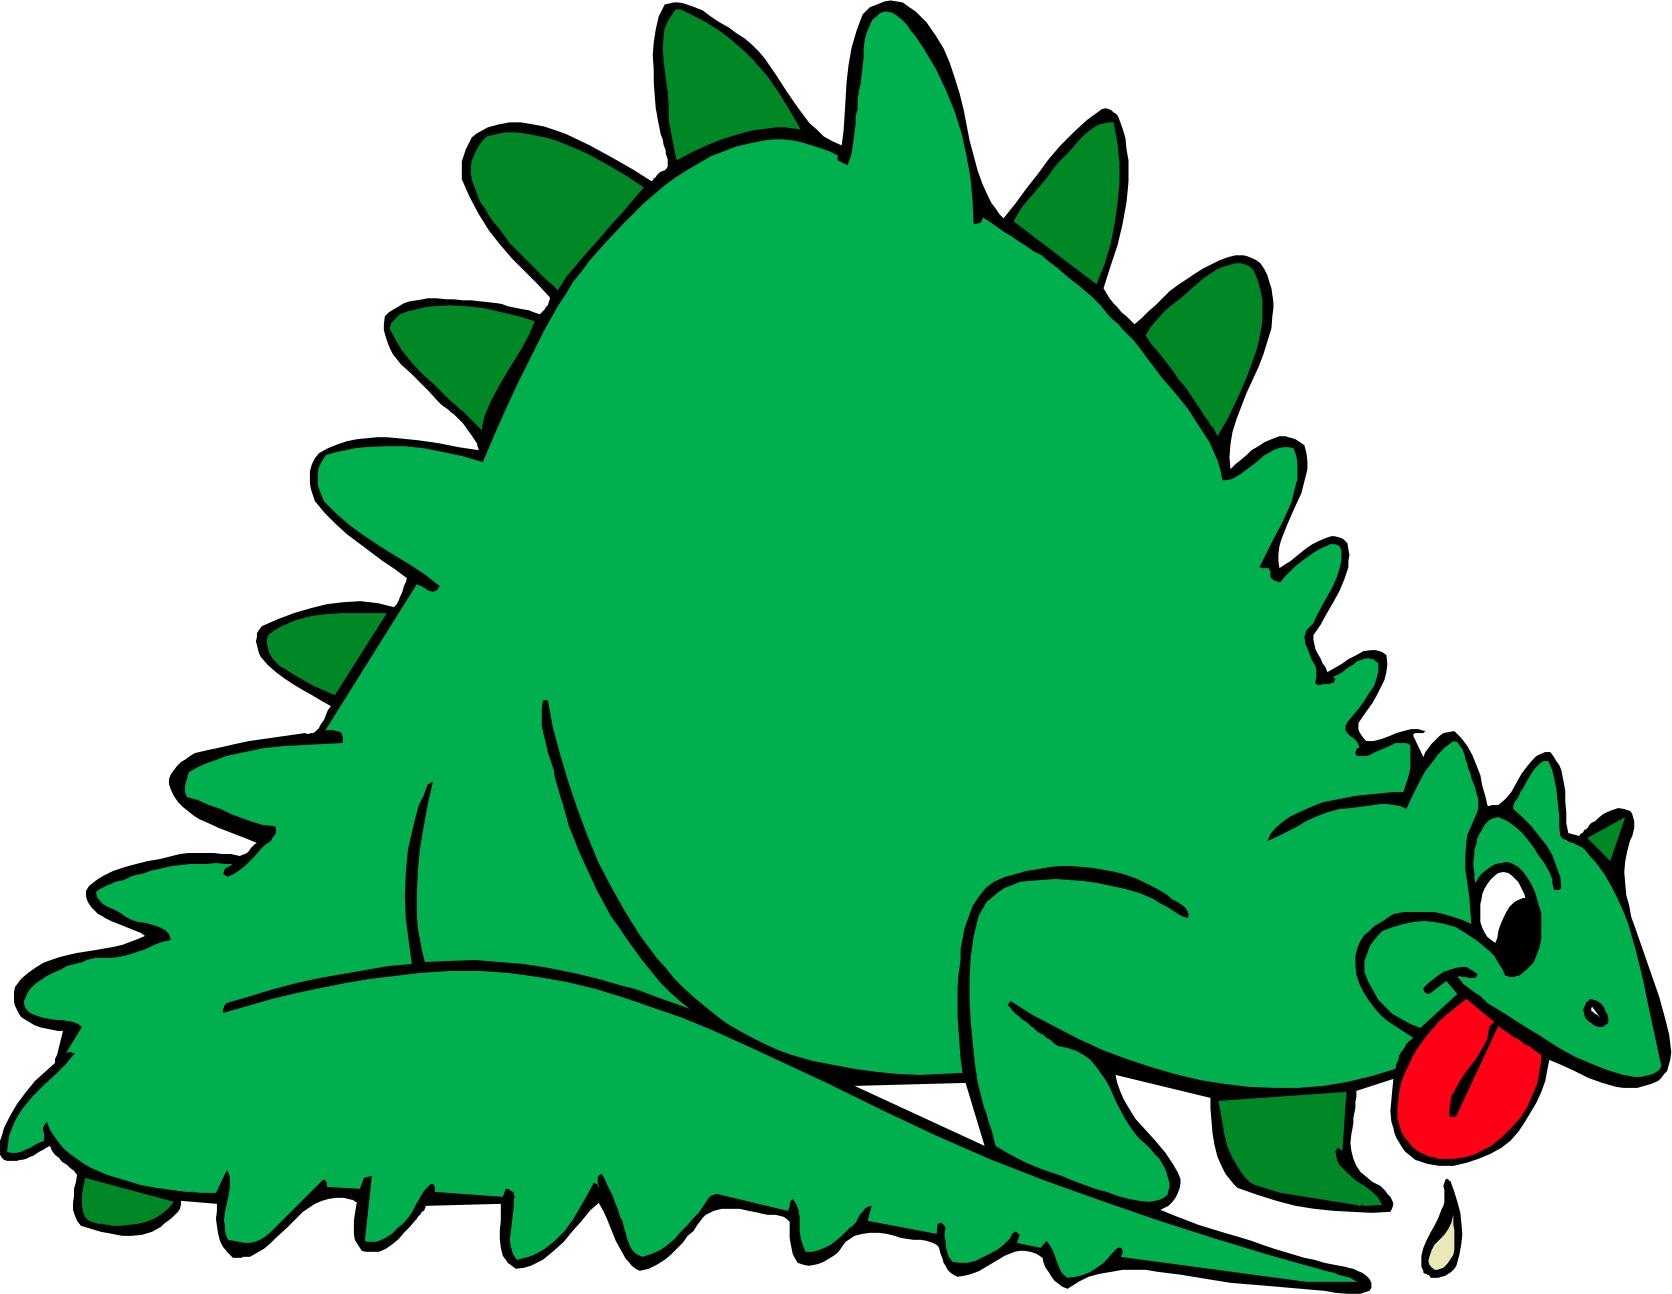 Stegosaurus Dinosaur Mascot